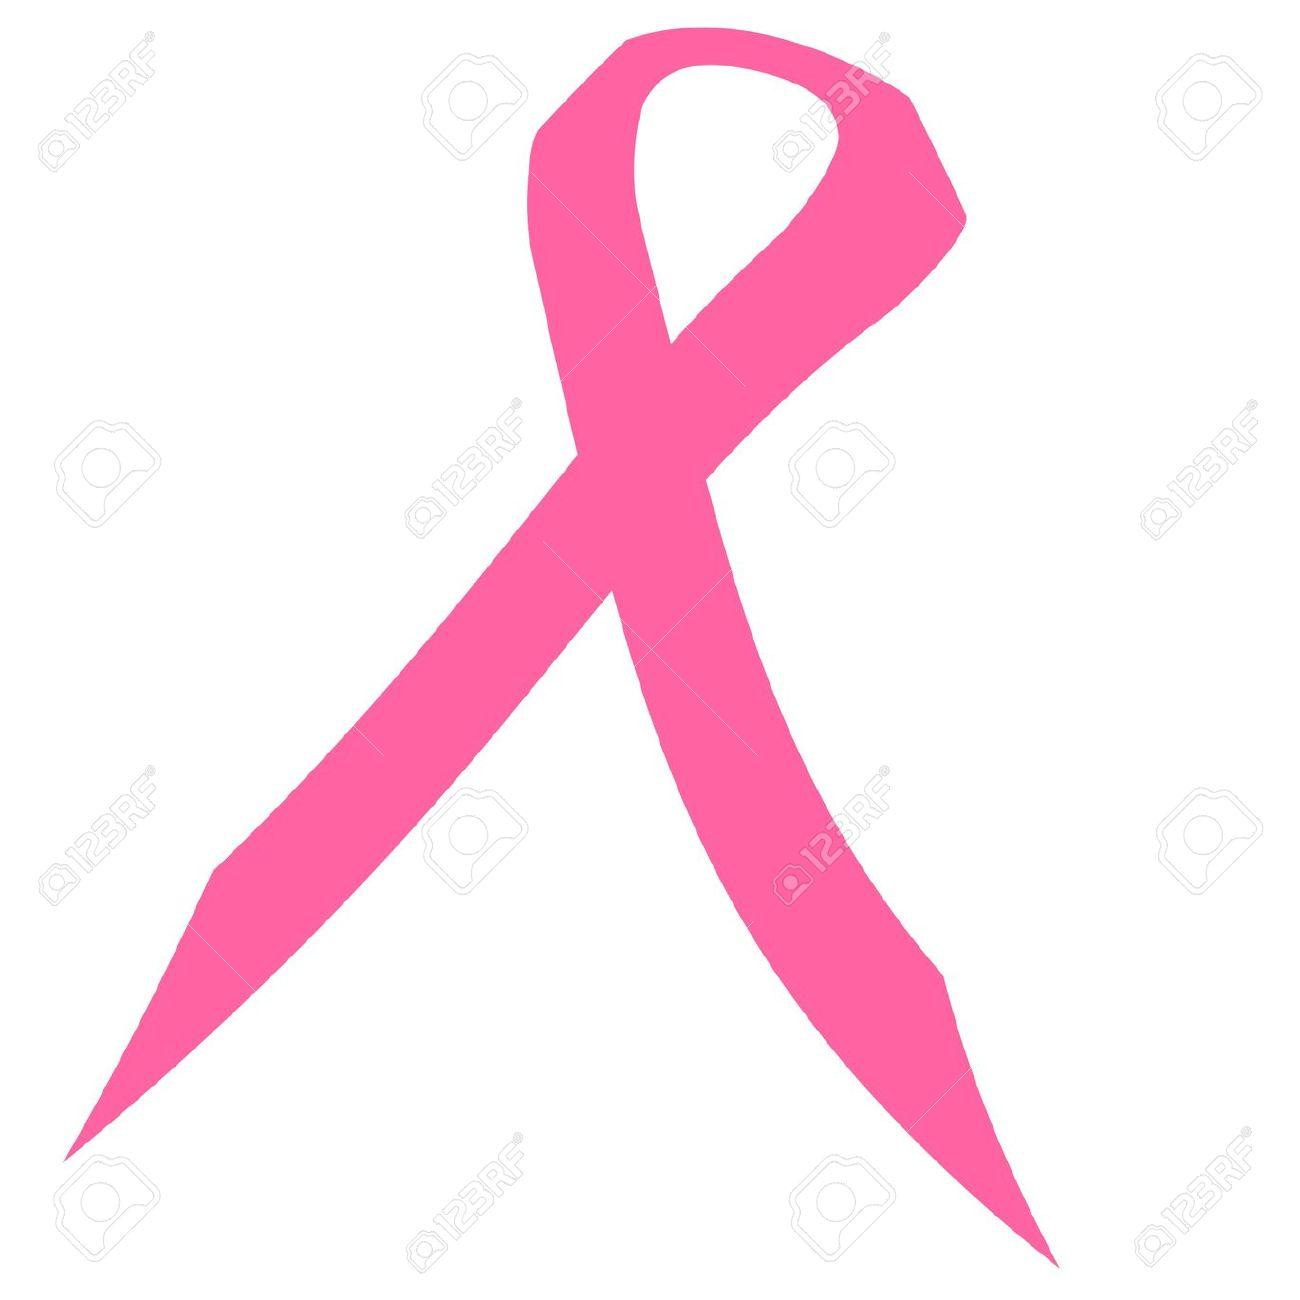 Cancer clipart pink ribbon, Cancer pink ribbon Transparent.